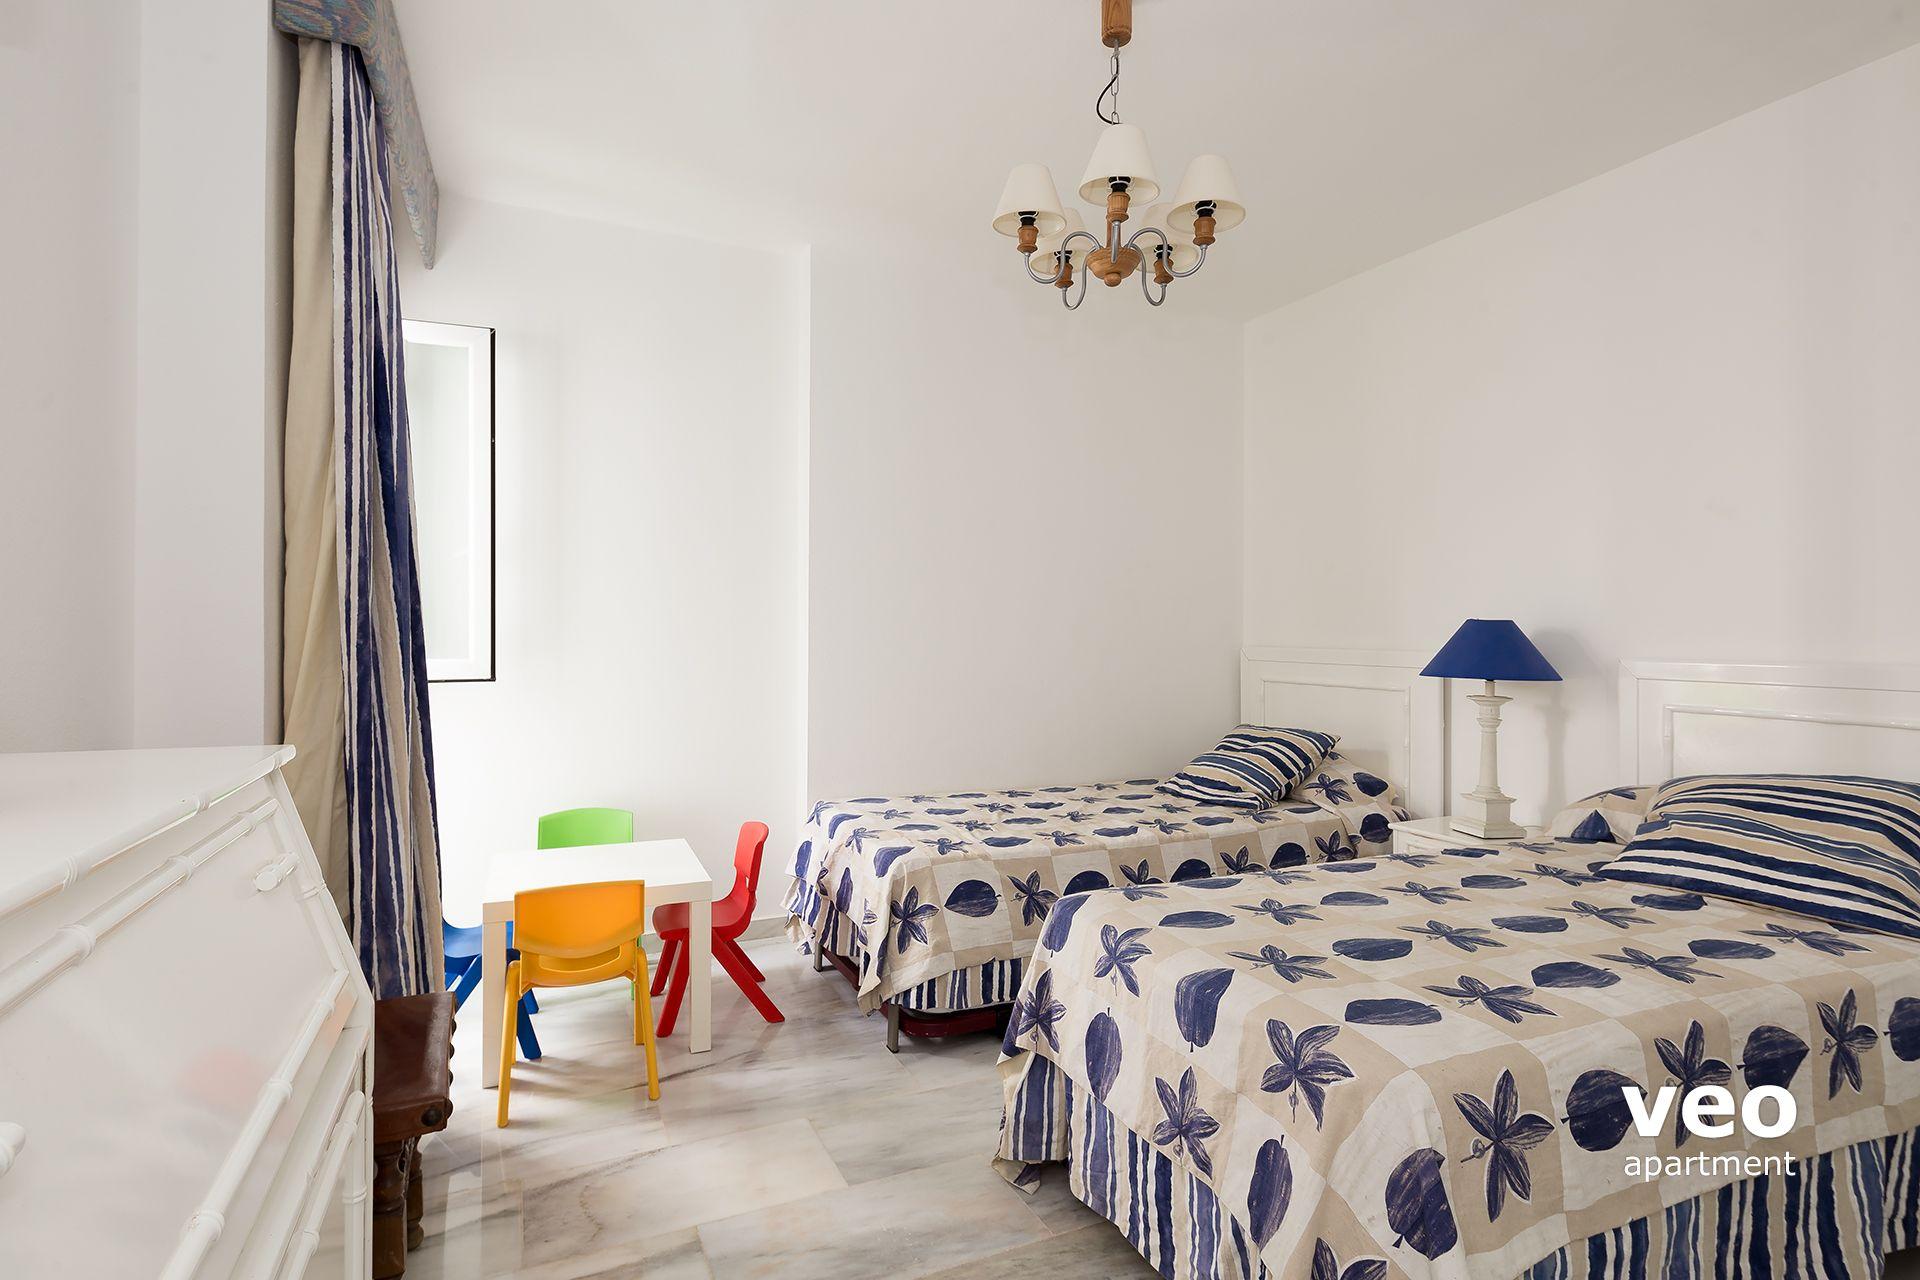 Marbella Bedroom Furniture Marbella Apartment Lunamar Urbanizacia3n Marbella Spain Lunamar 1